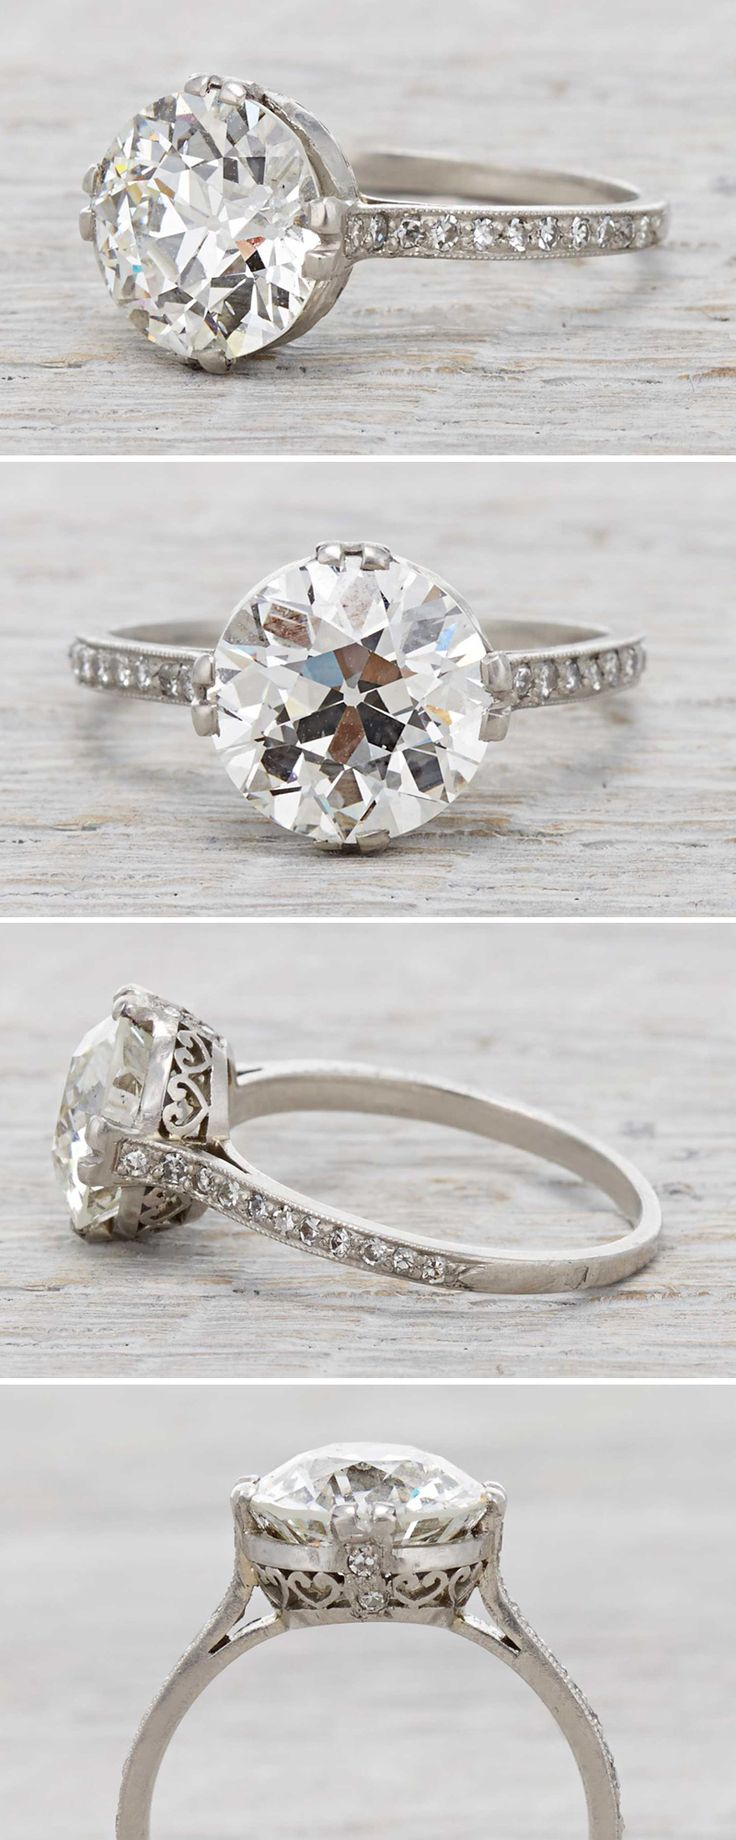 Art Deco vintage engagement ring with a 3 77 Carat Diamond Circa 1920